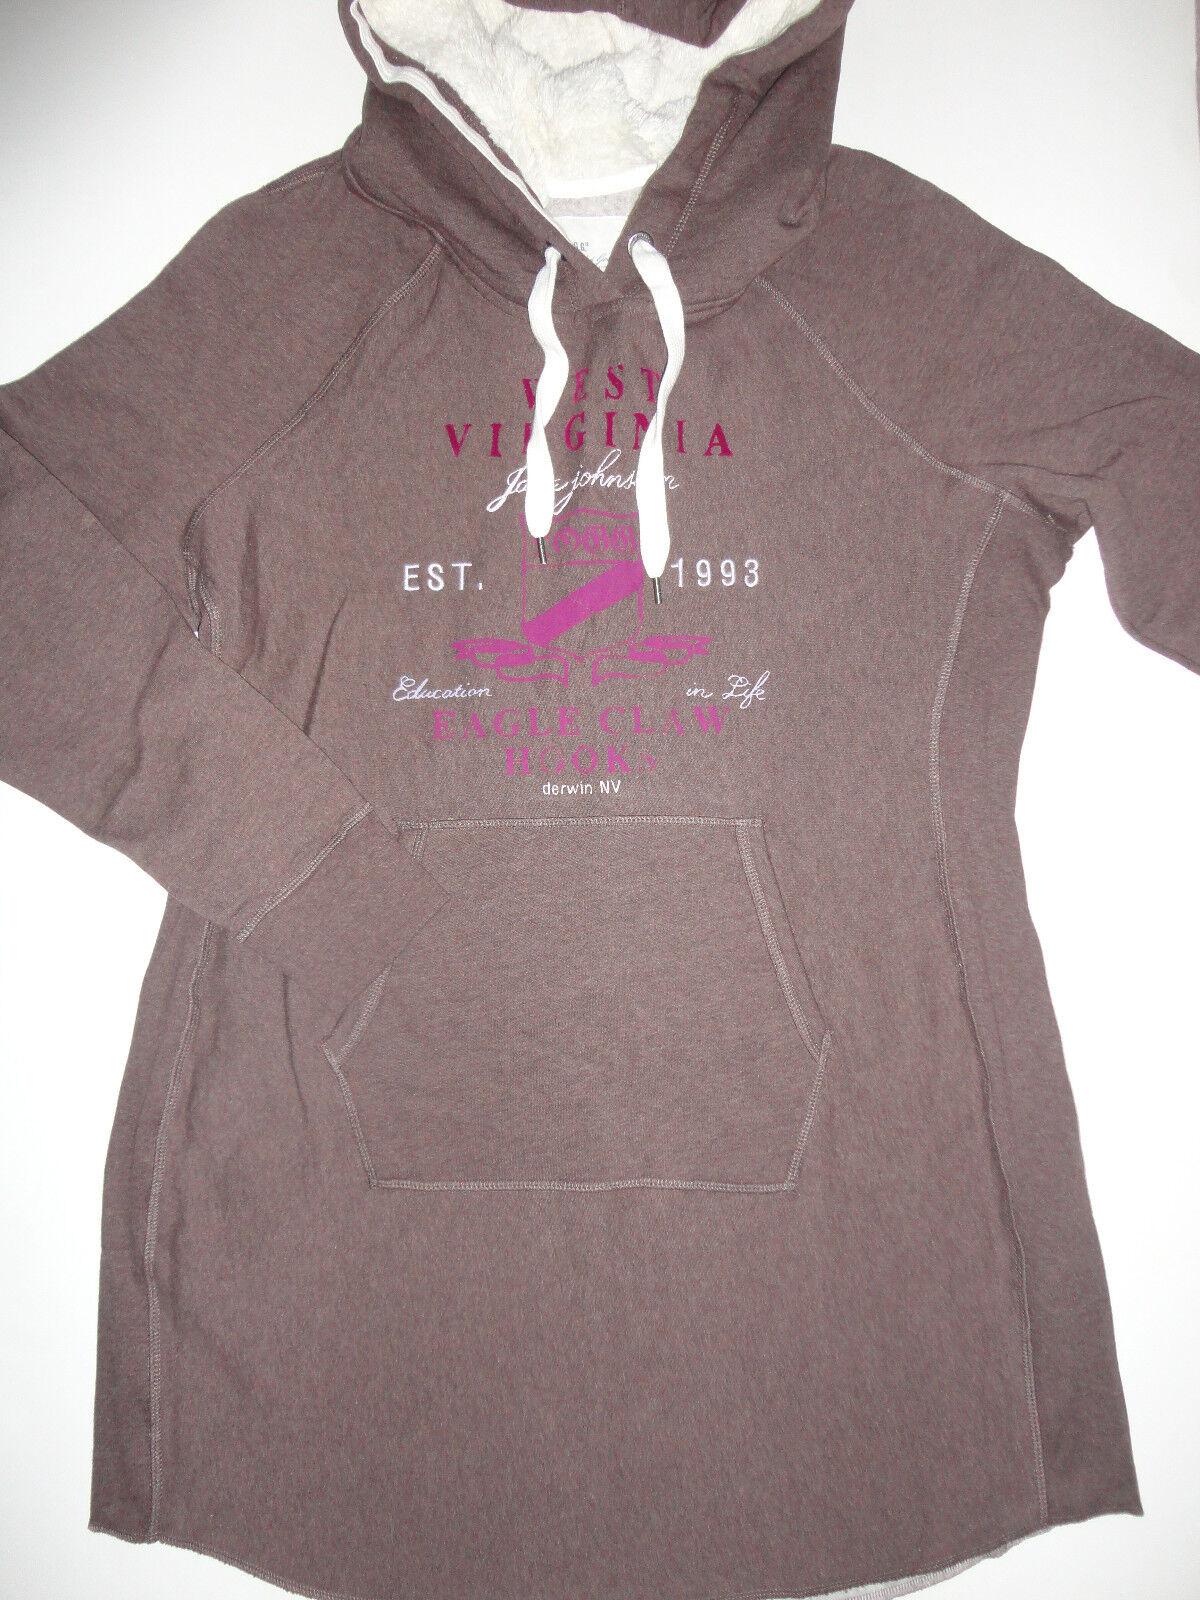 NEU H&M Sweatshirtkleid Kleid Kapuzenshirt Gr.M,Gr.XL braun zu Hose Leggings